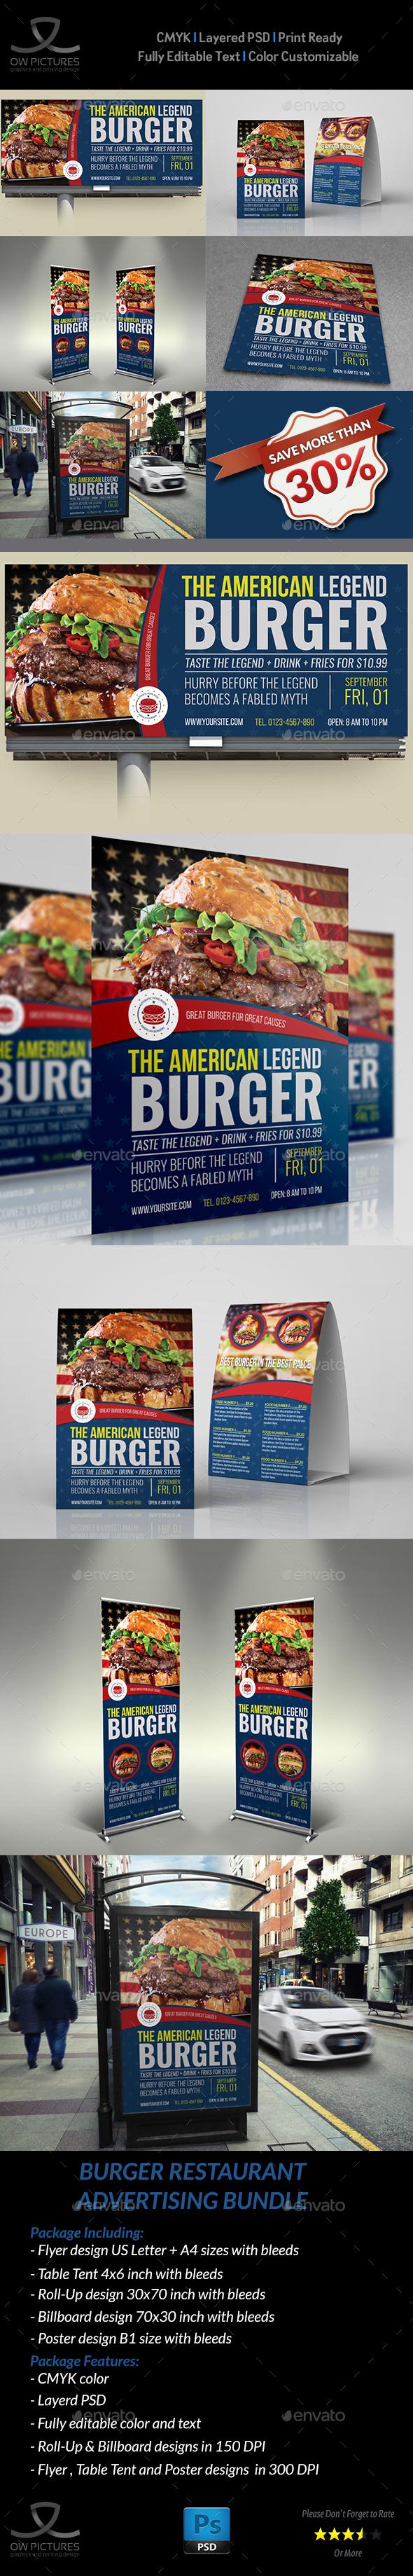 Burger Restaurant Advertising Bundle Vol.4 - Signage Print Templates